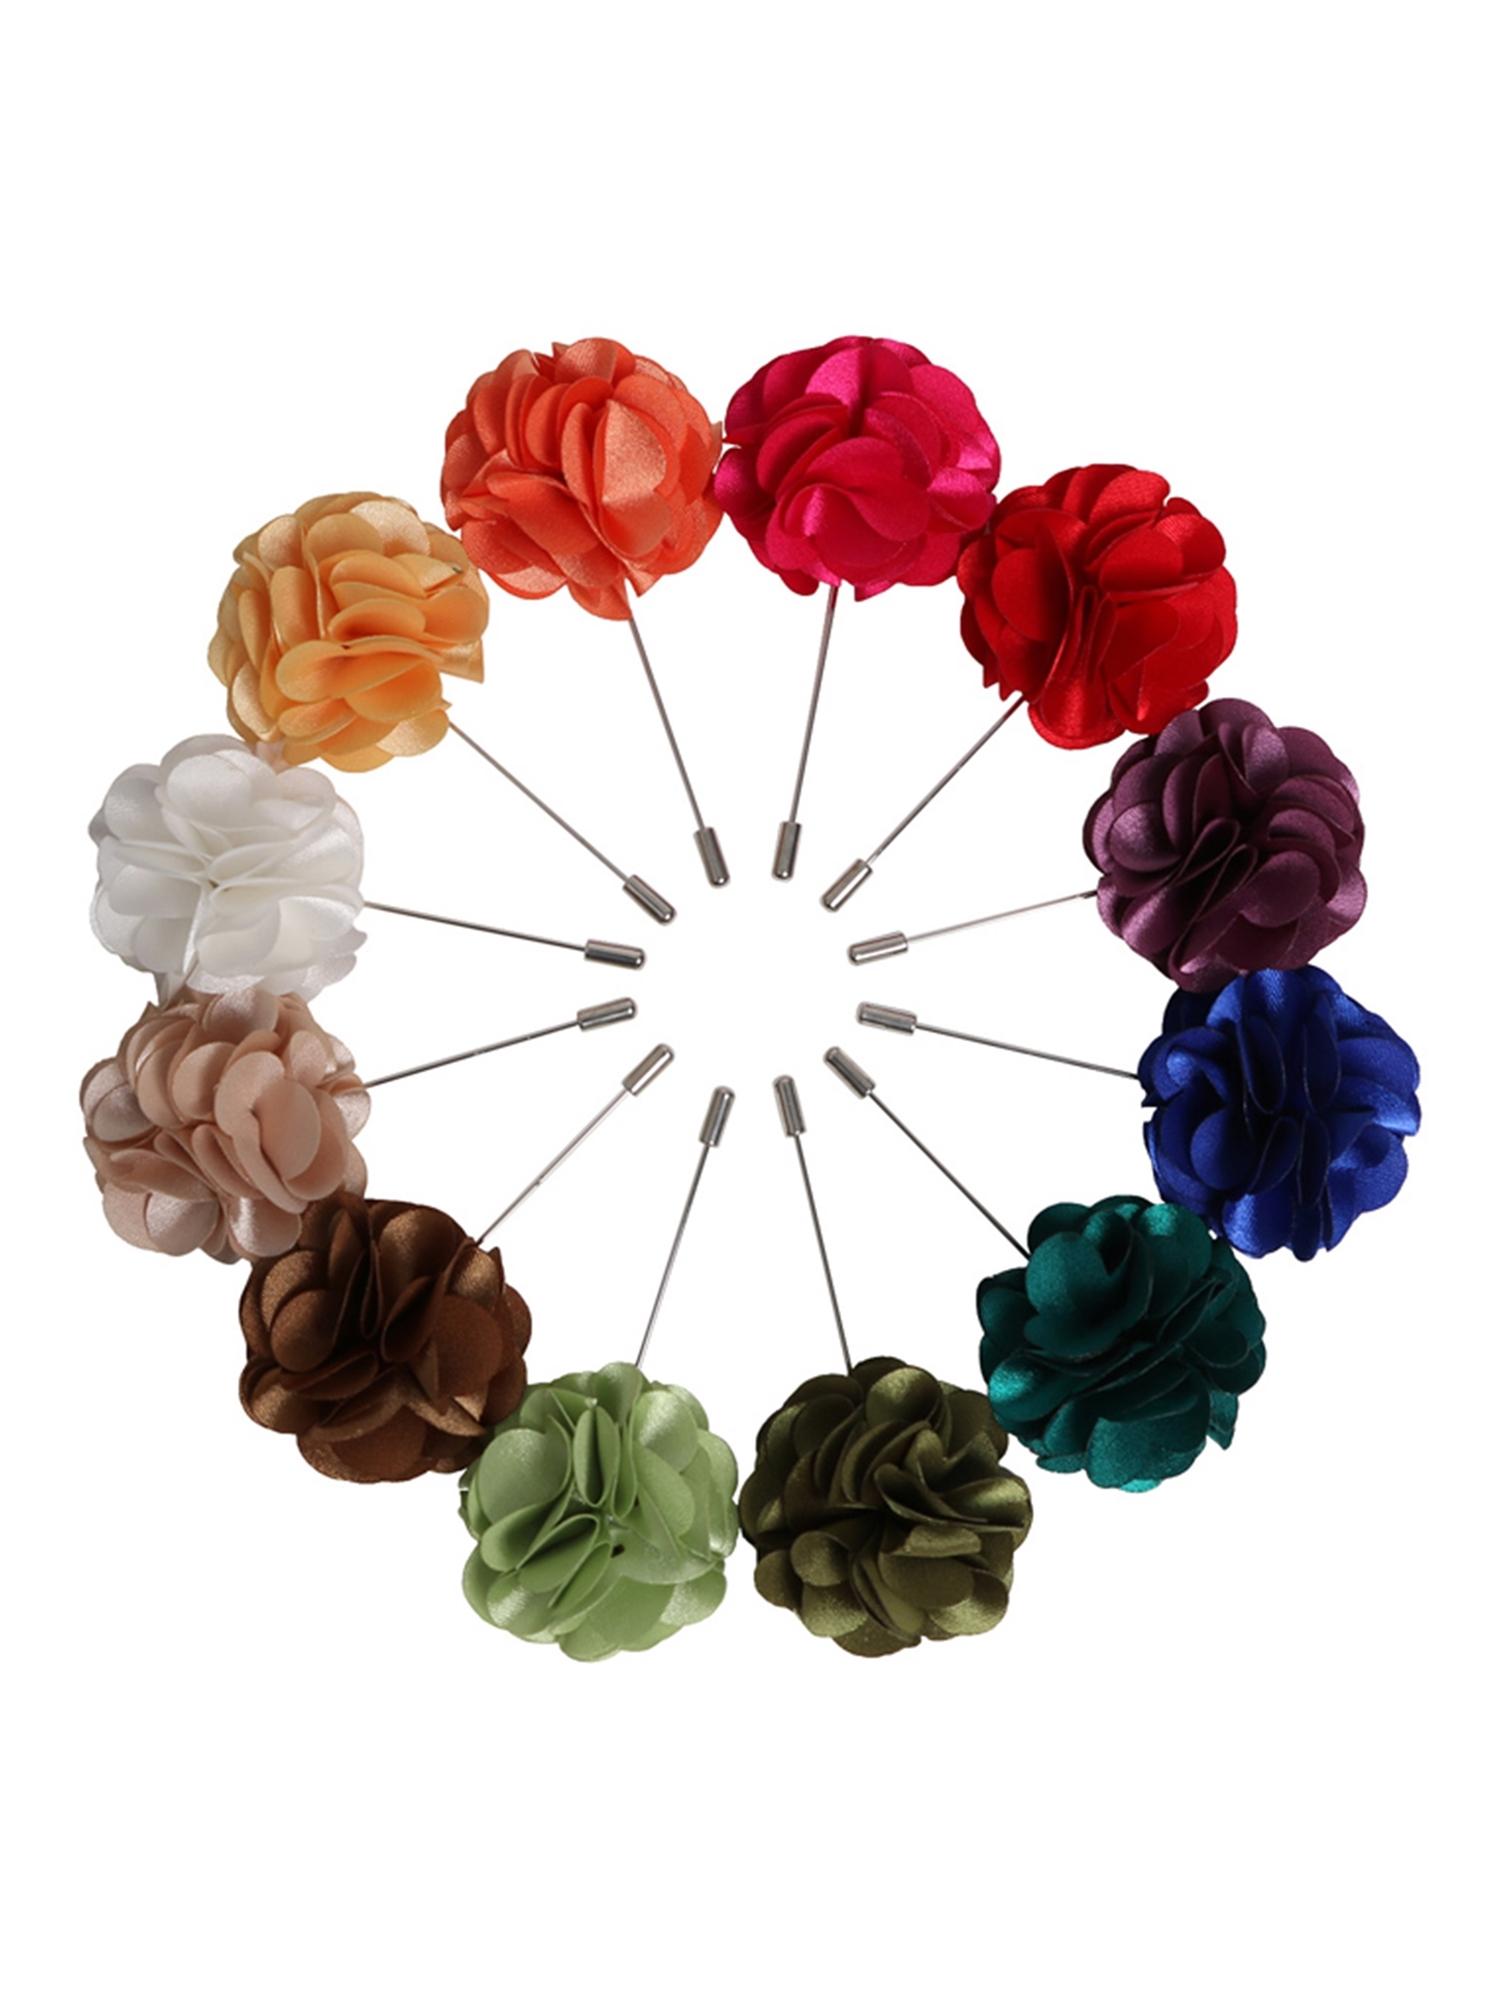 Mens Flower Lapel Pin Boutonniere For Suit Ebay